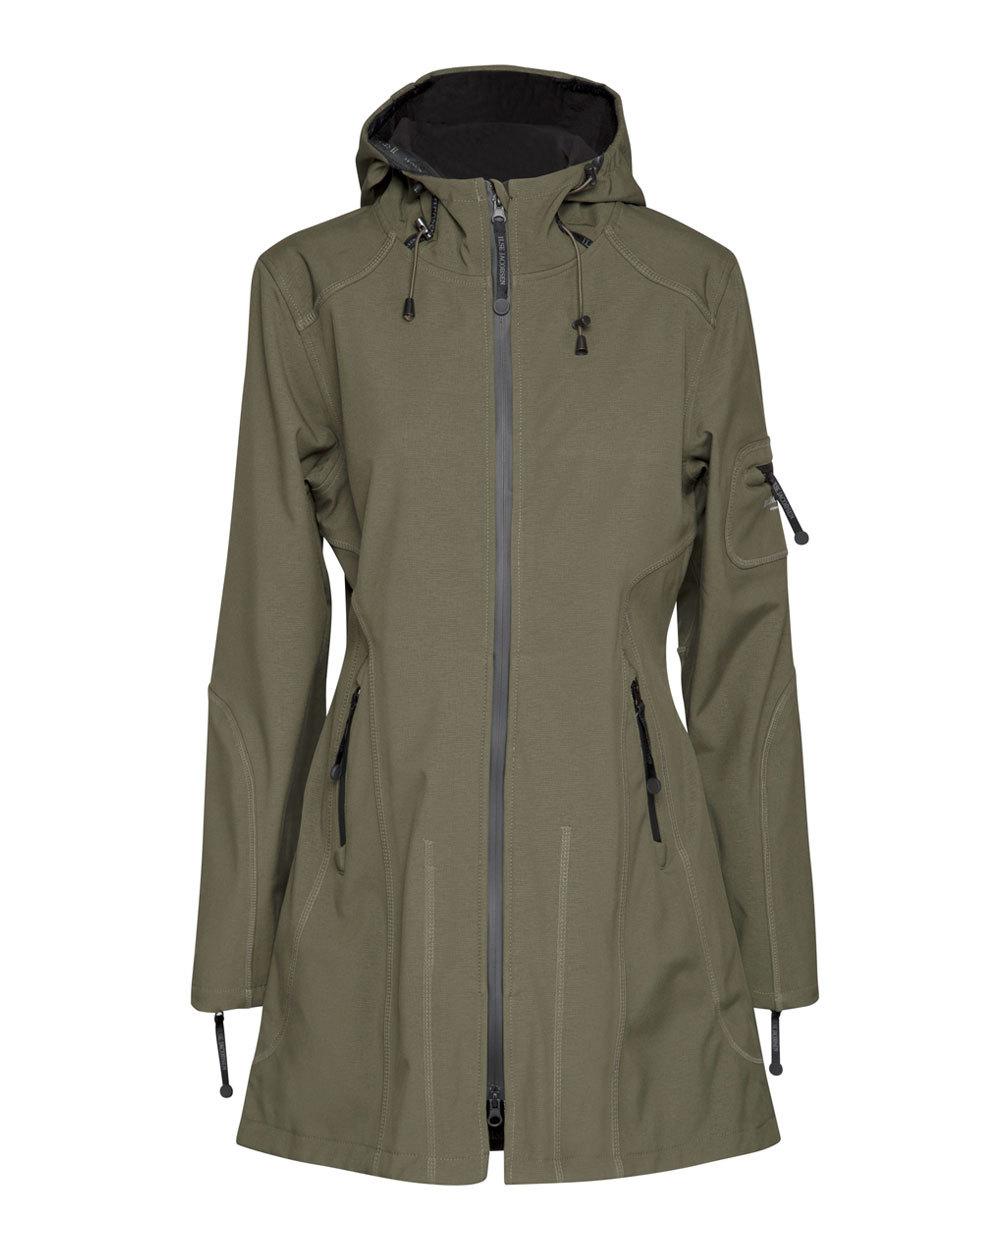 Ilse Jacobsen Raincoat in Army Black